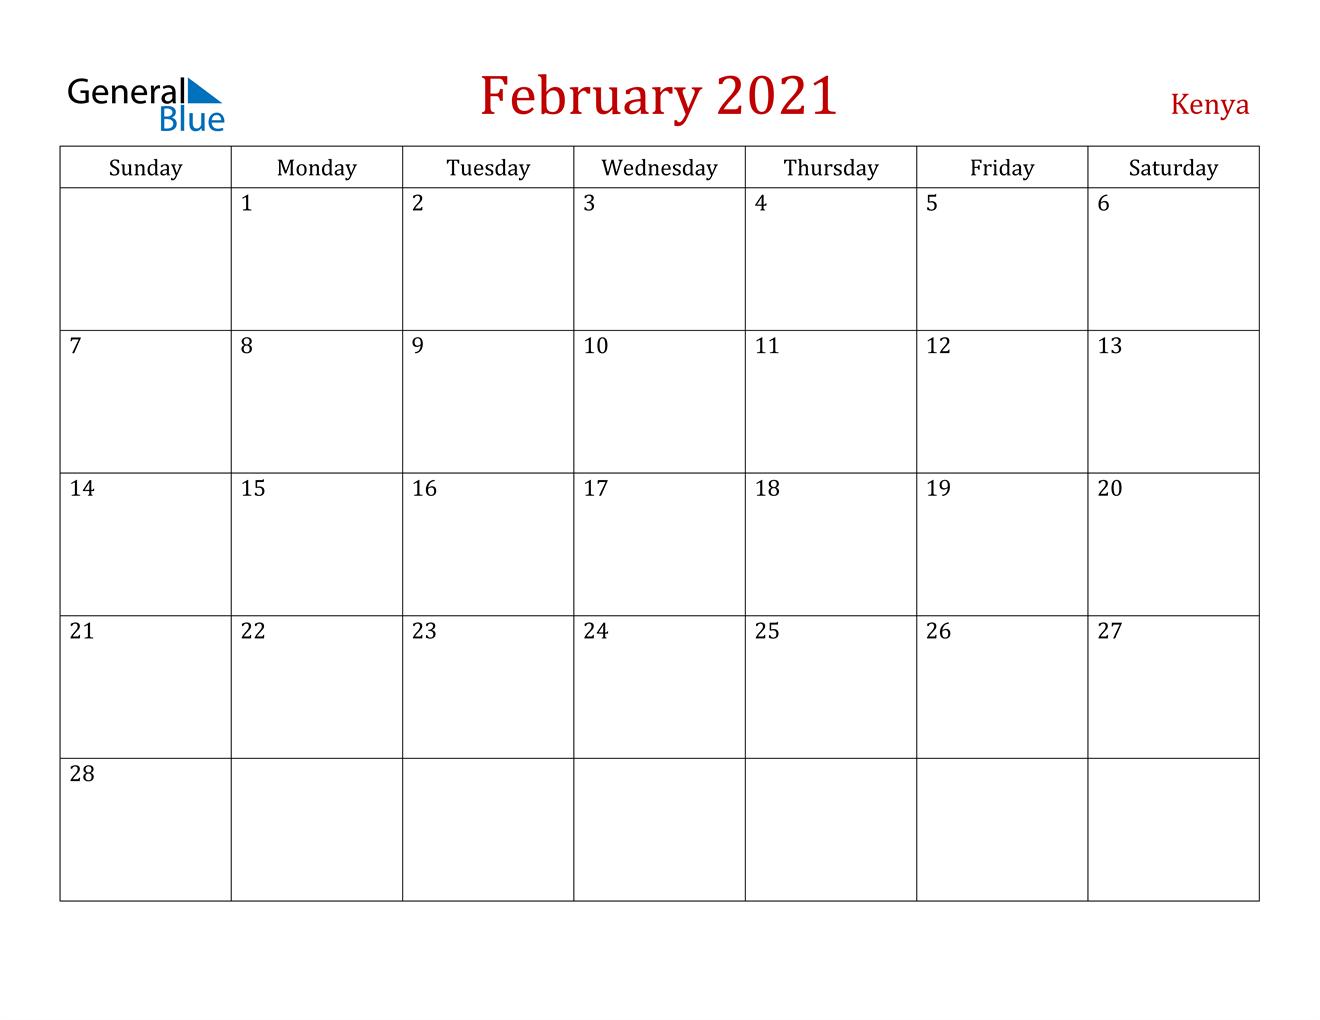 February 2021 Calendar - Kenya